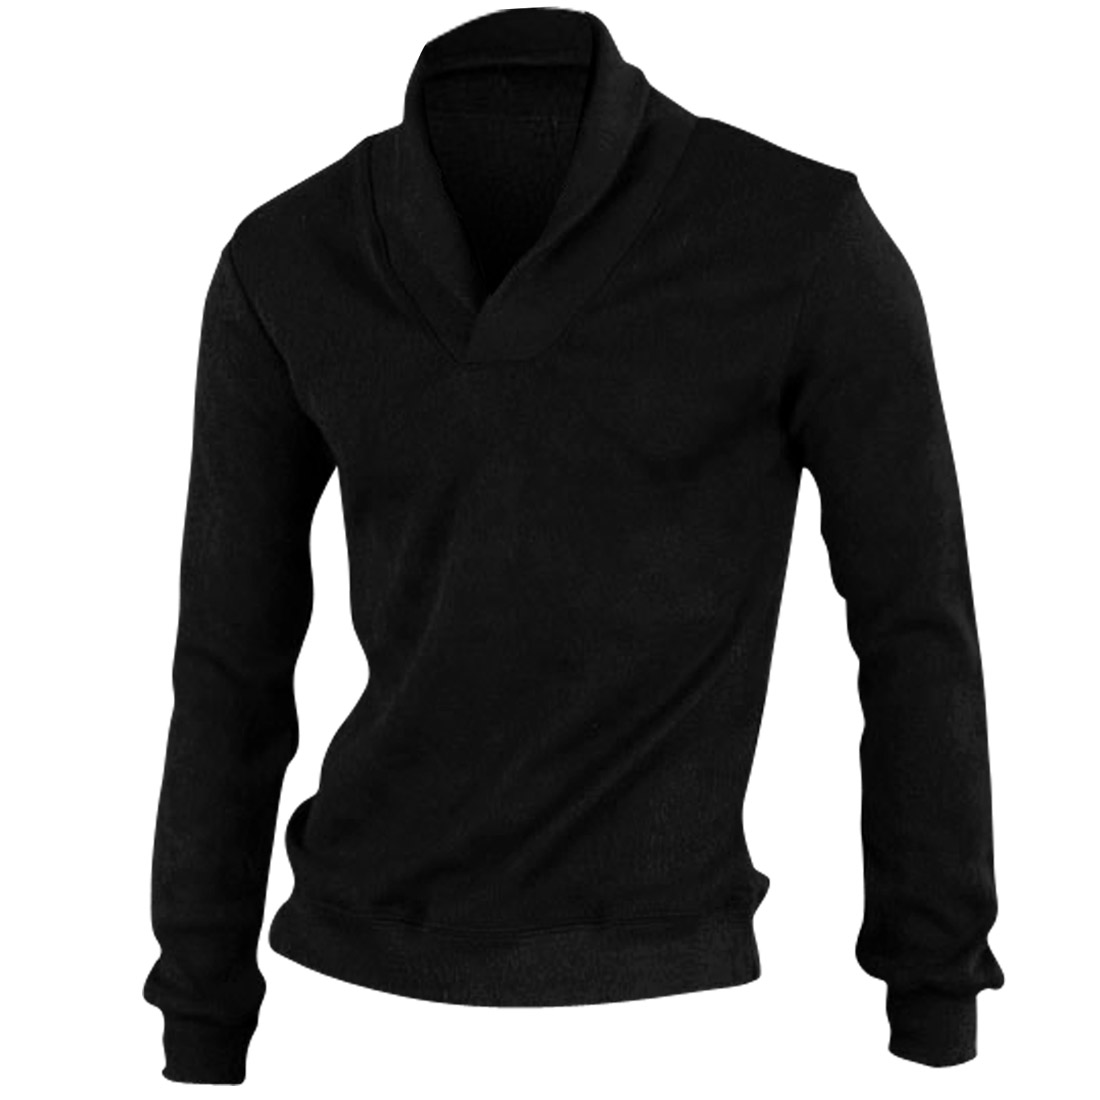 Men Convertible Collar Long Sleeved Slim Black Knit Shirt M